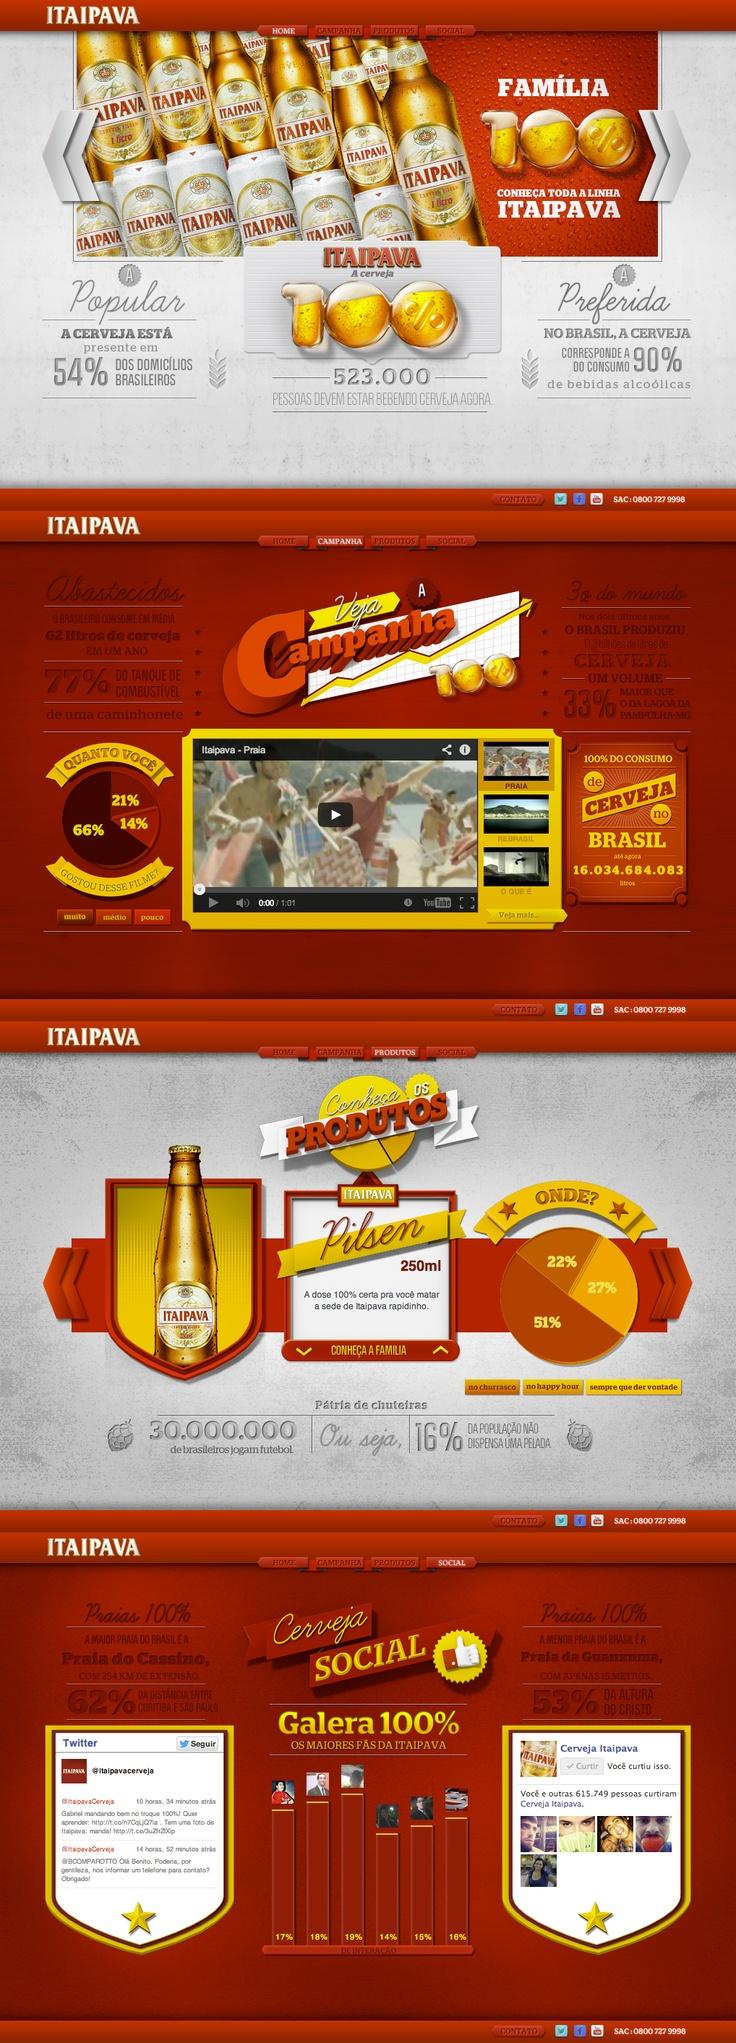 Unique Web Design, Itaipava #WebDesign #Design (http://www.pinterest.com/aldenchong/)